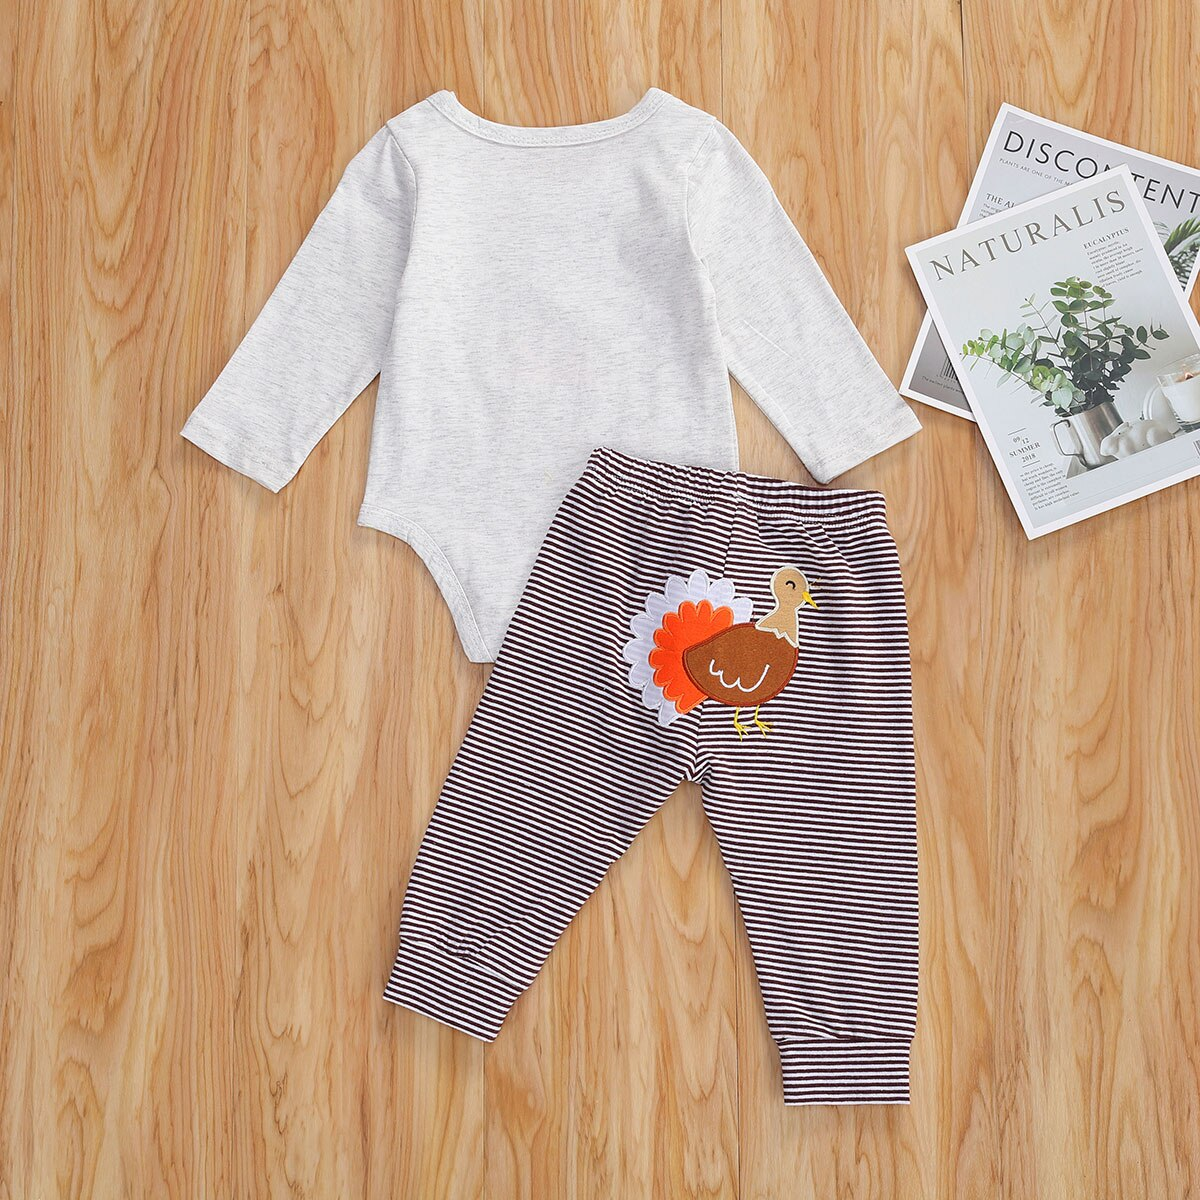 Thanksgiving Days Boys Girls Clothes Sets 0-12M Turkey Print Long Sleeve Romper Tops Striped Pants